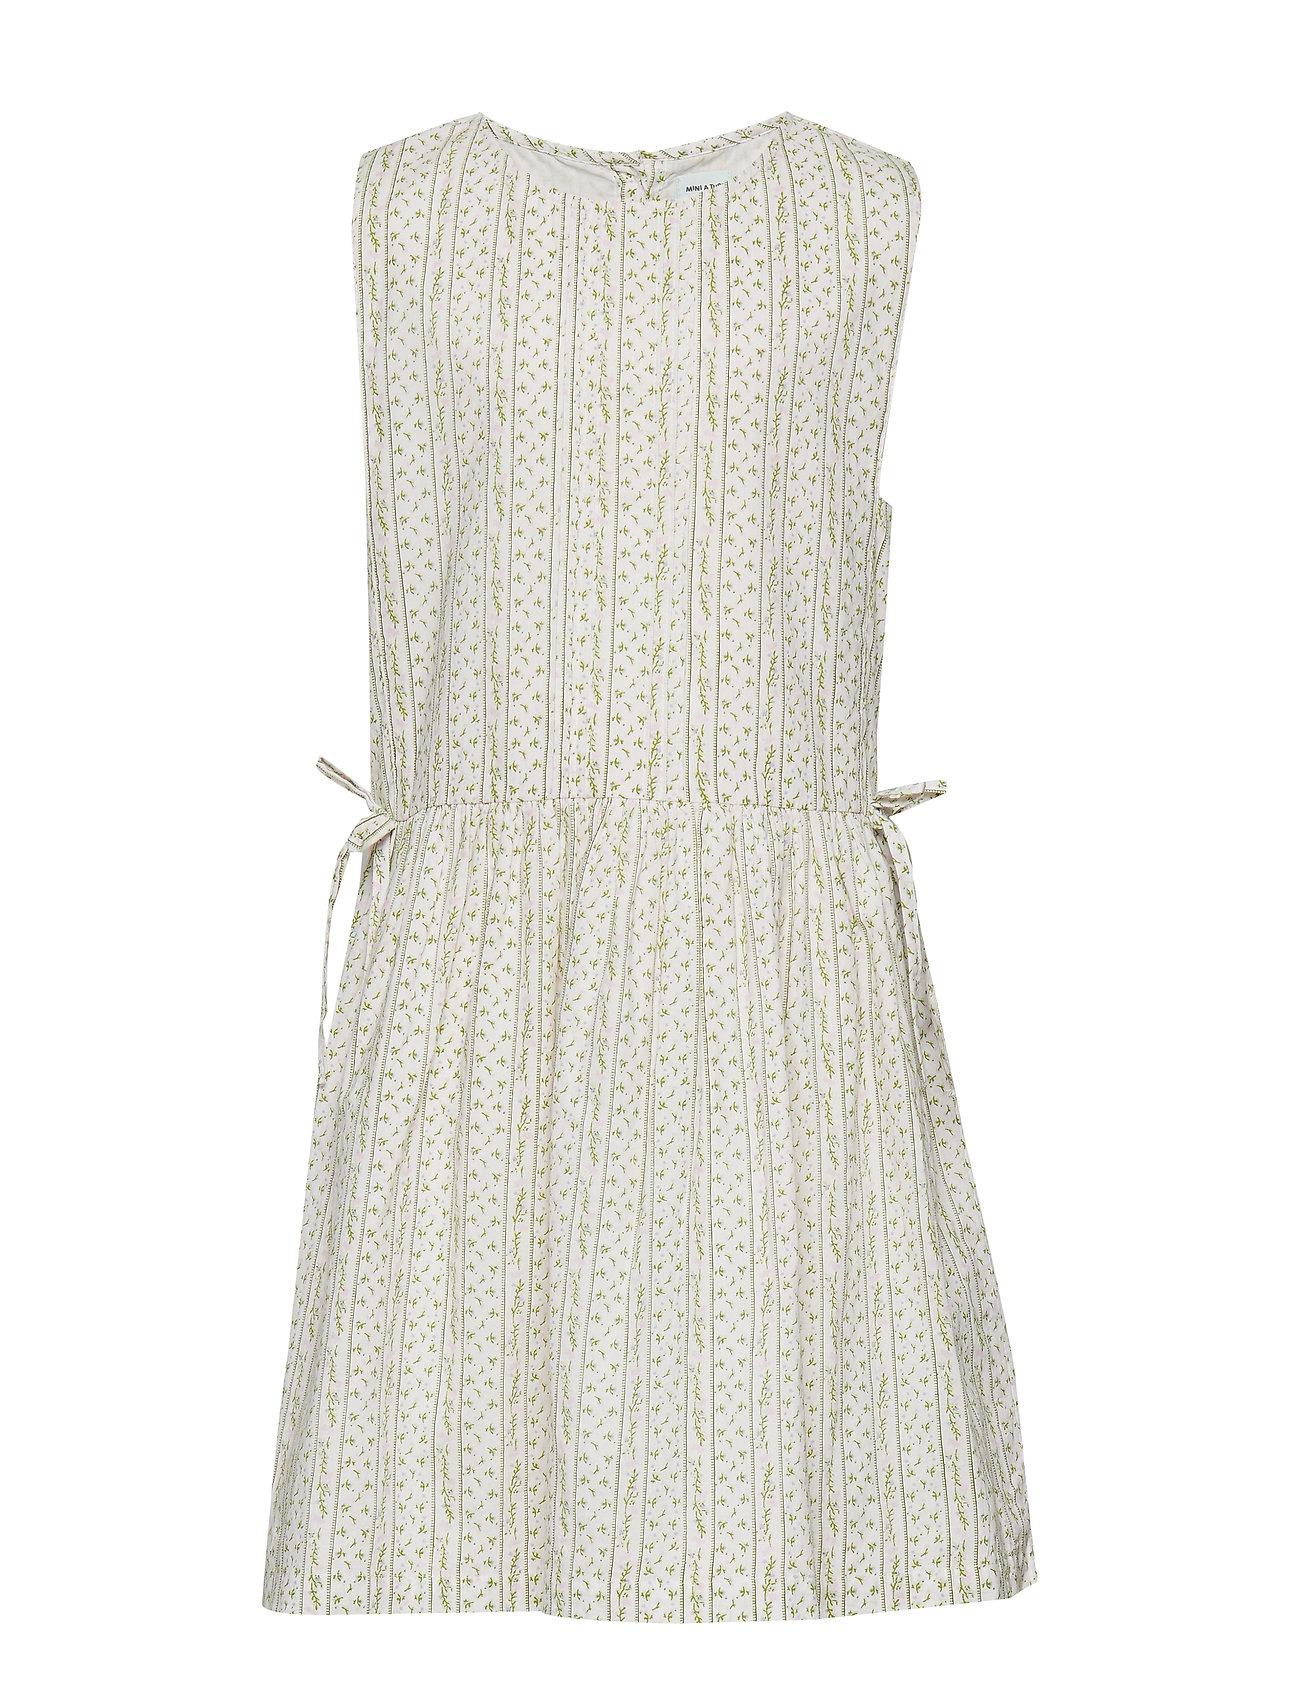 Mini A Ture Sofie Dress, K